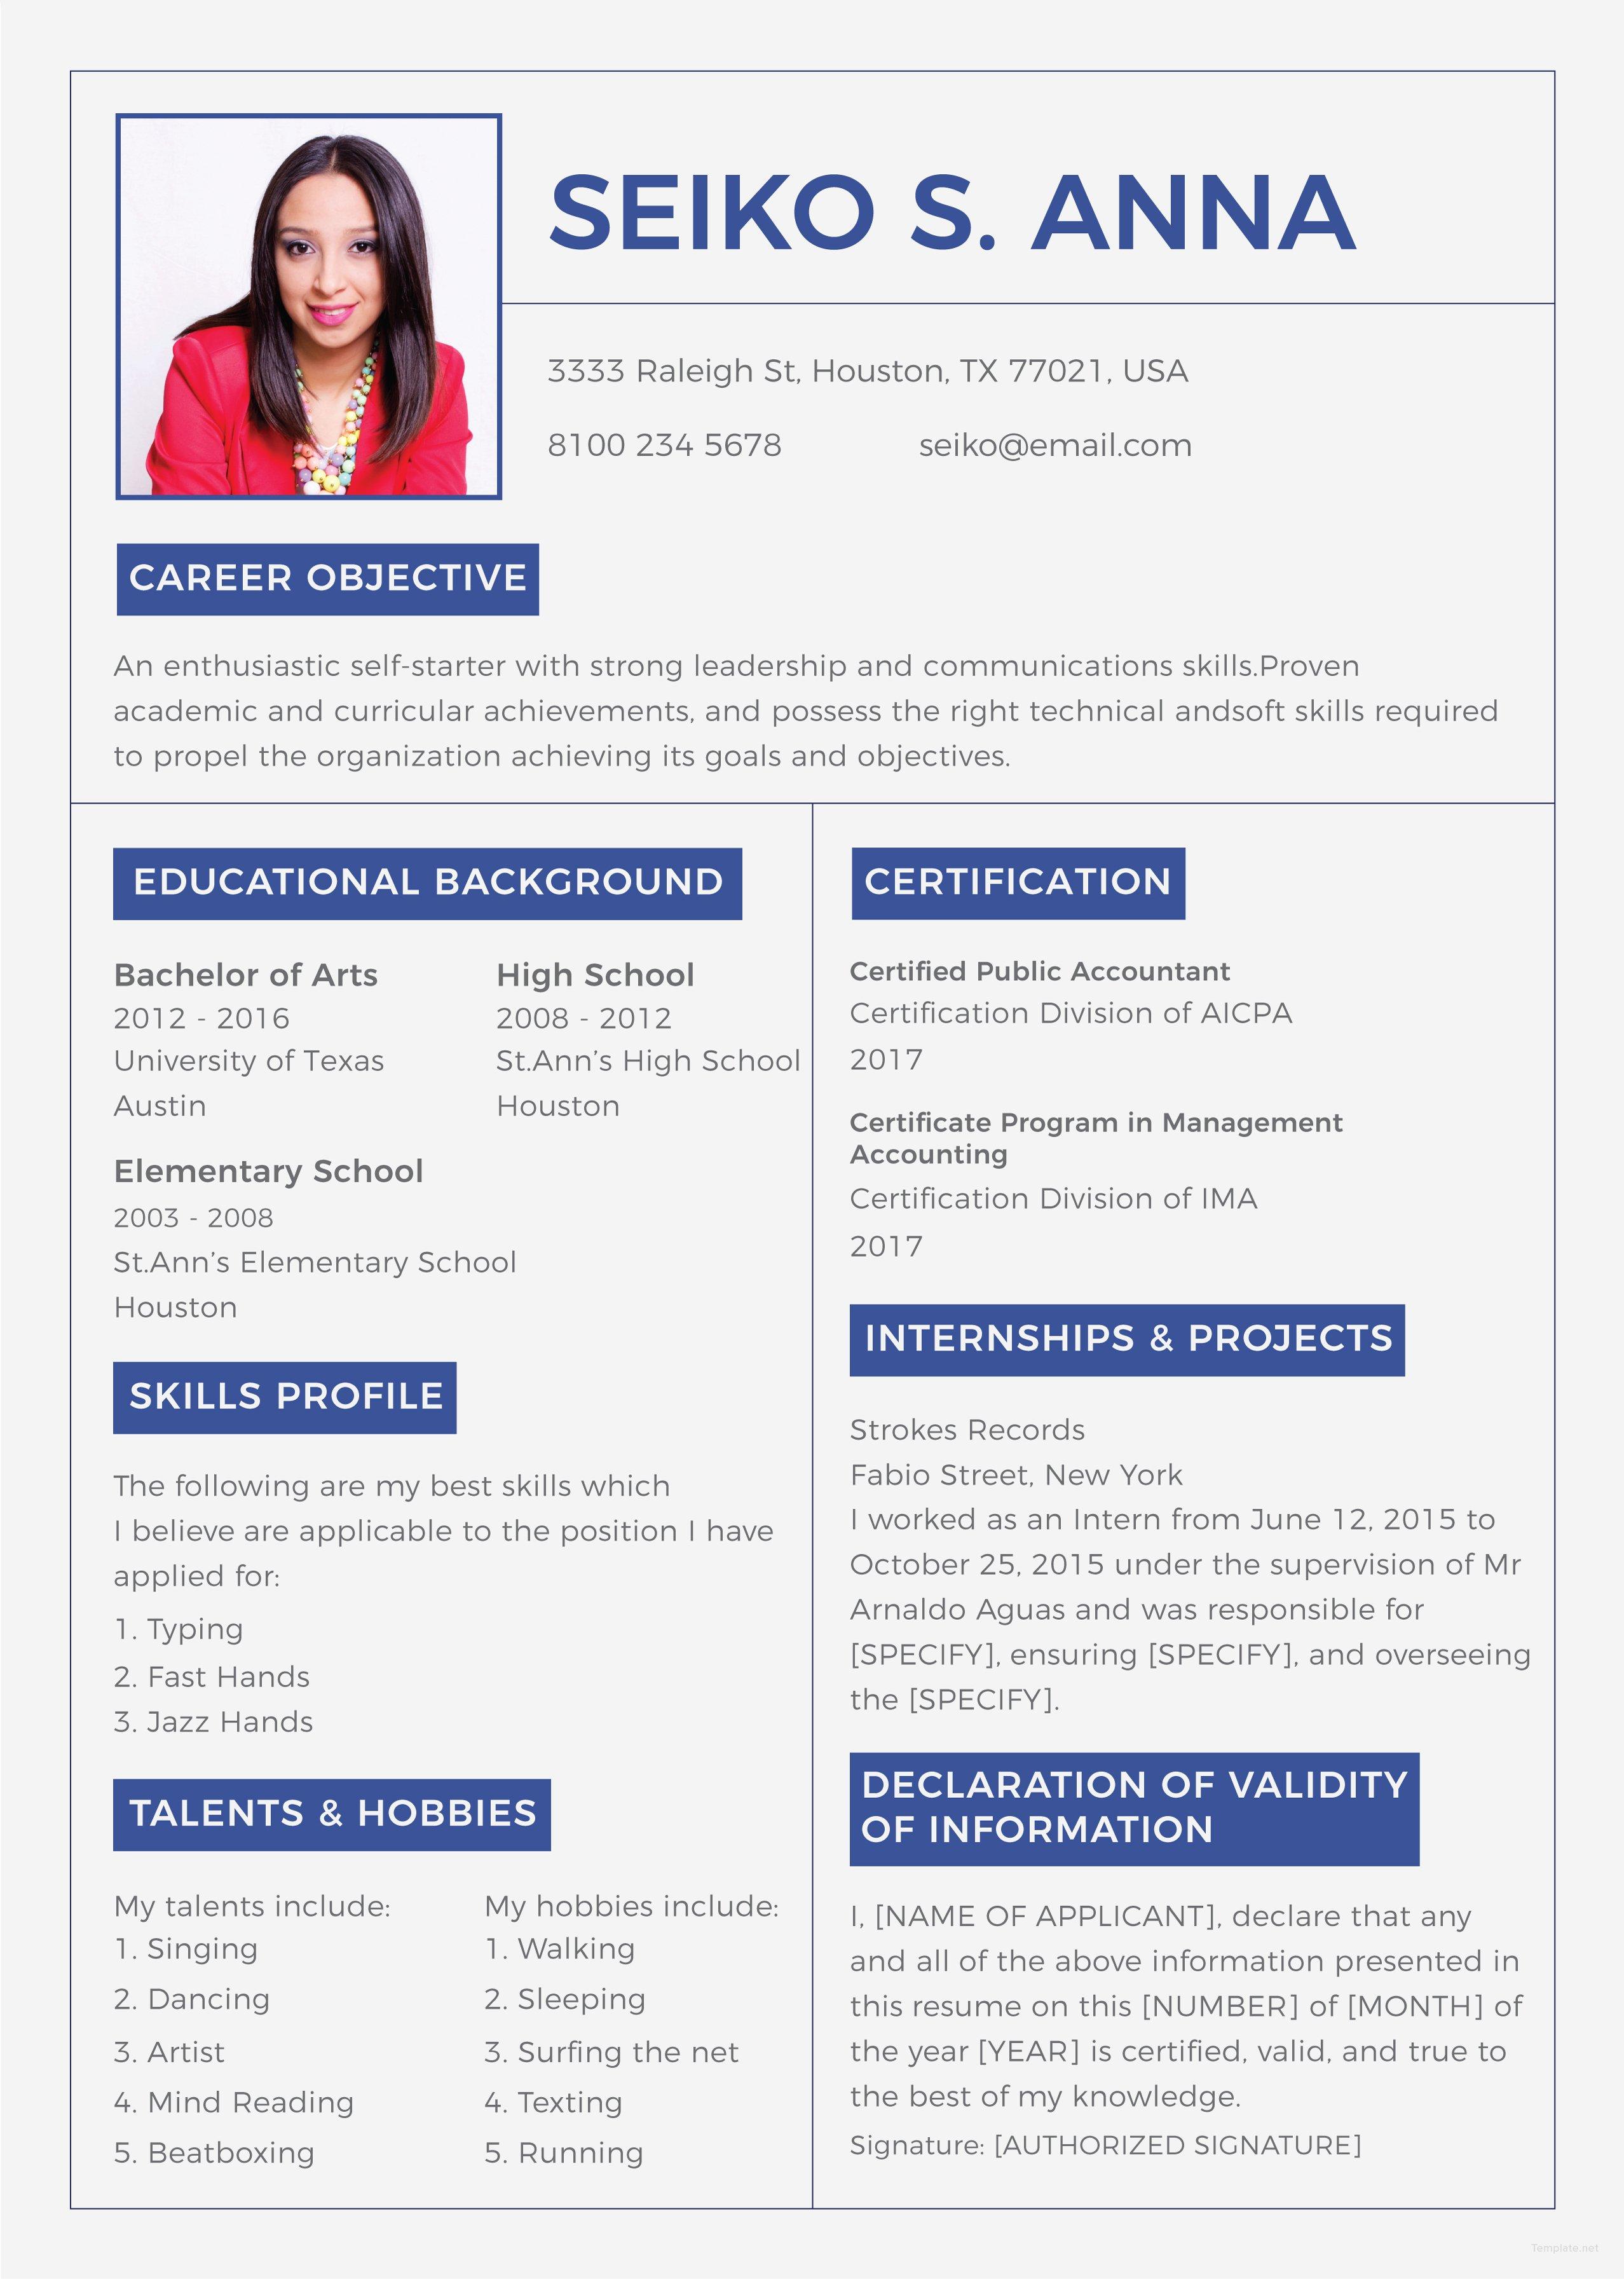 free college resume template in adobe illustrator